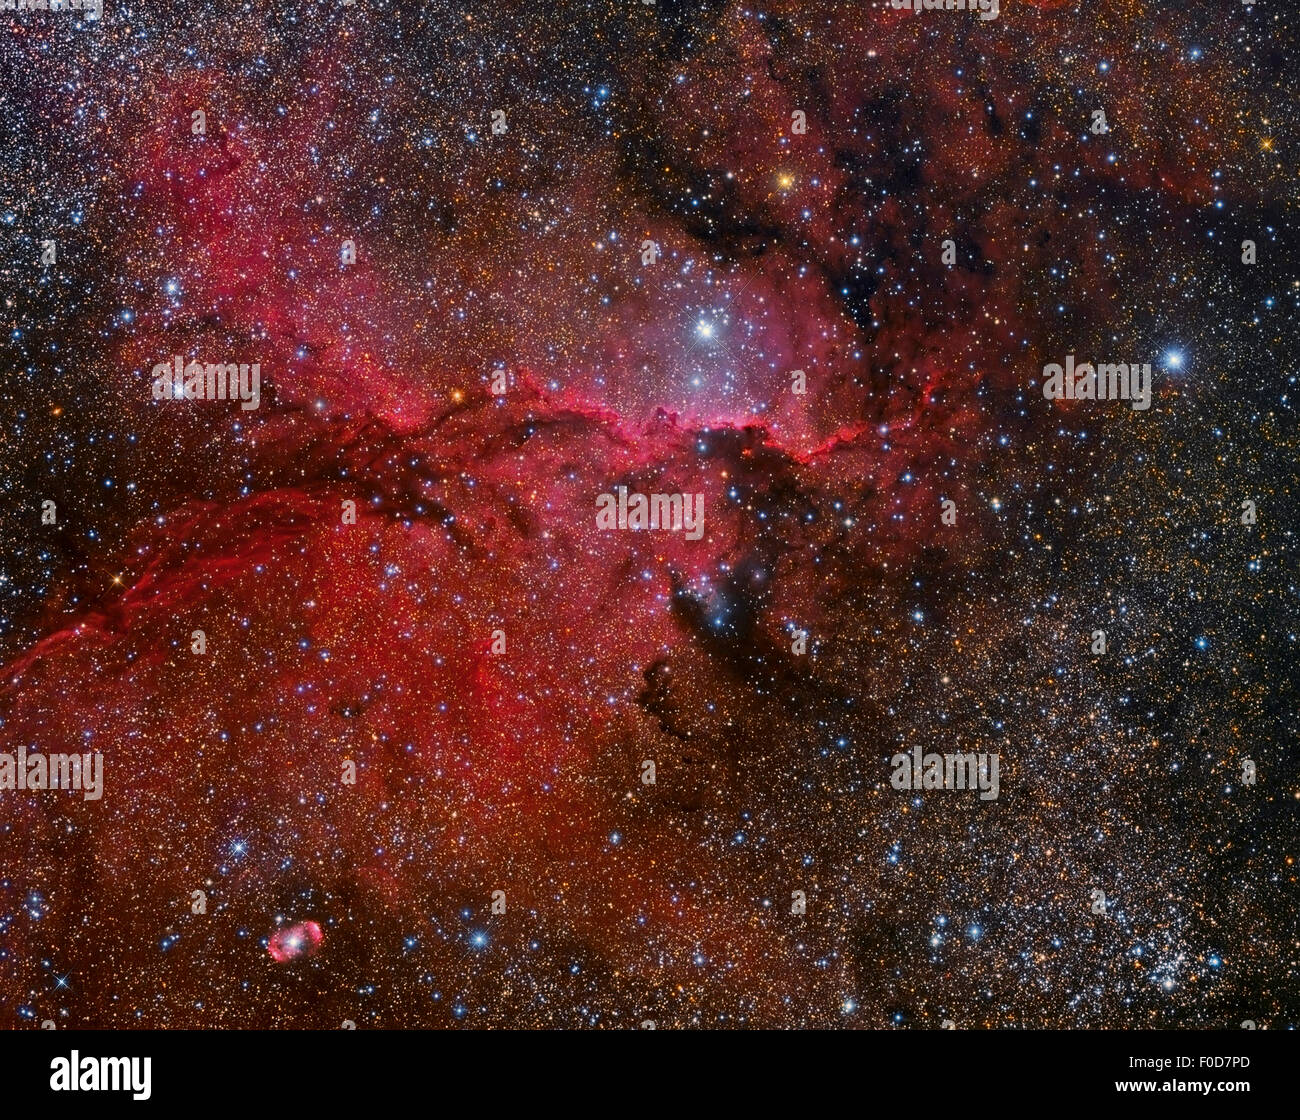 NGC 6188 emission nebula in the Ara constellation. - Stock Image